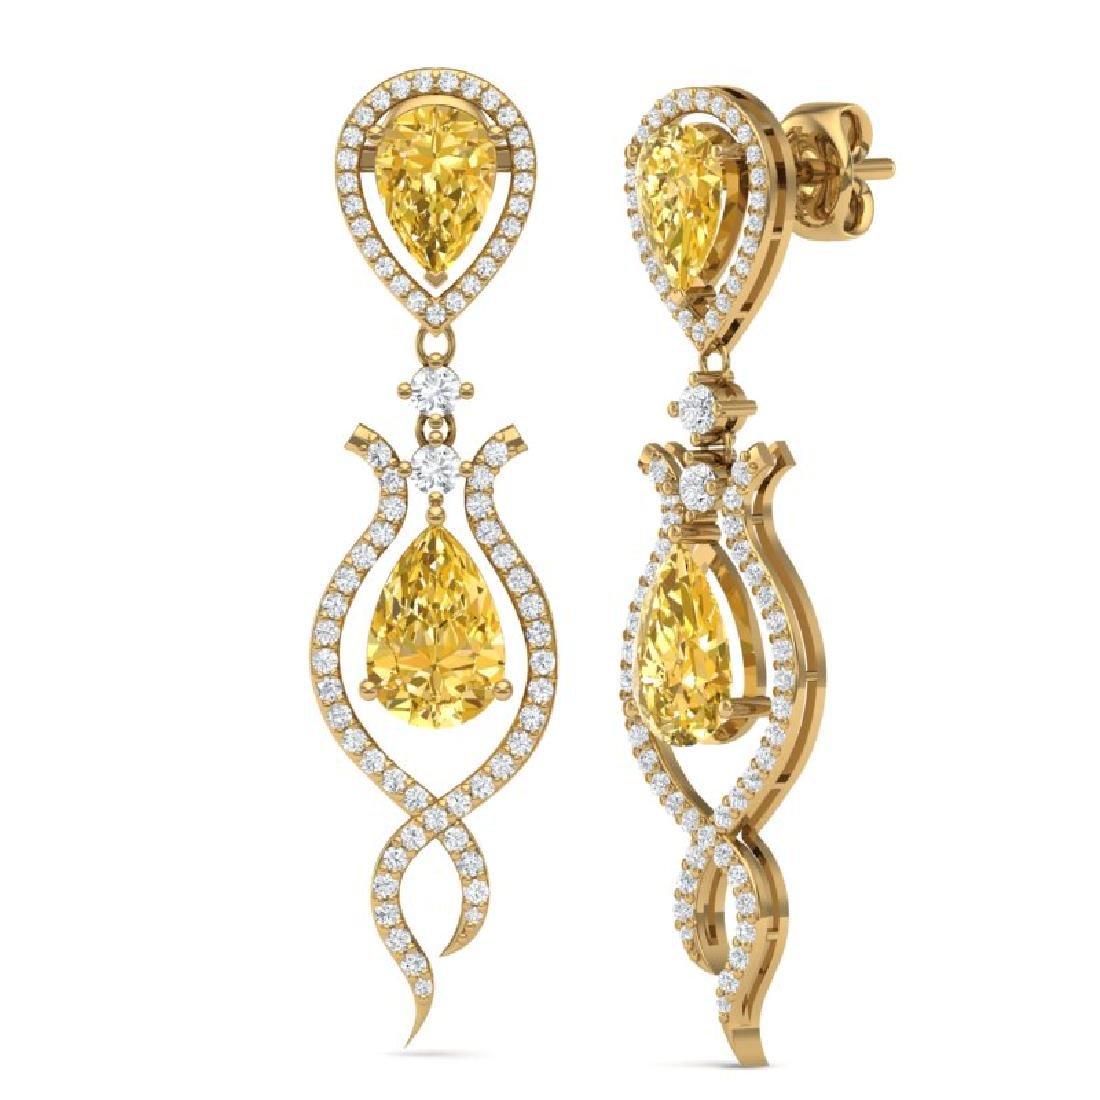 14.09 CTW Royalty Canary Citrine & VS Diamond Earrings - 3